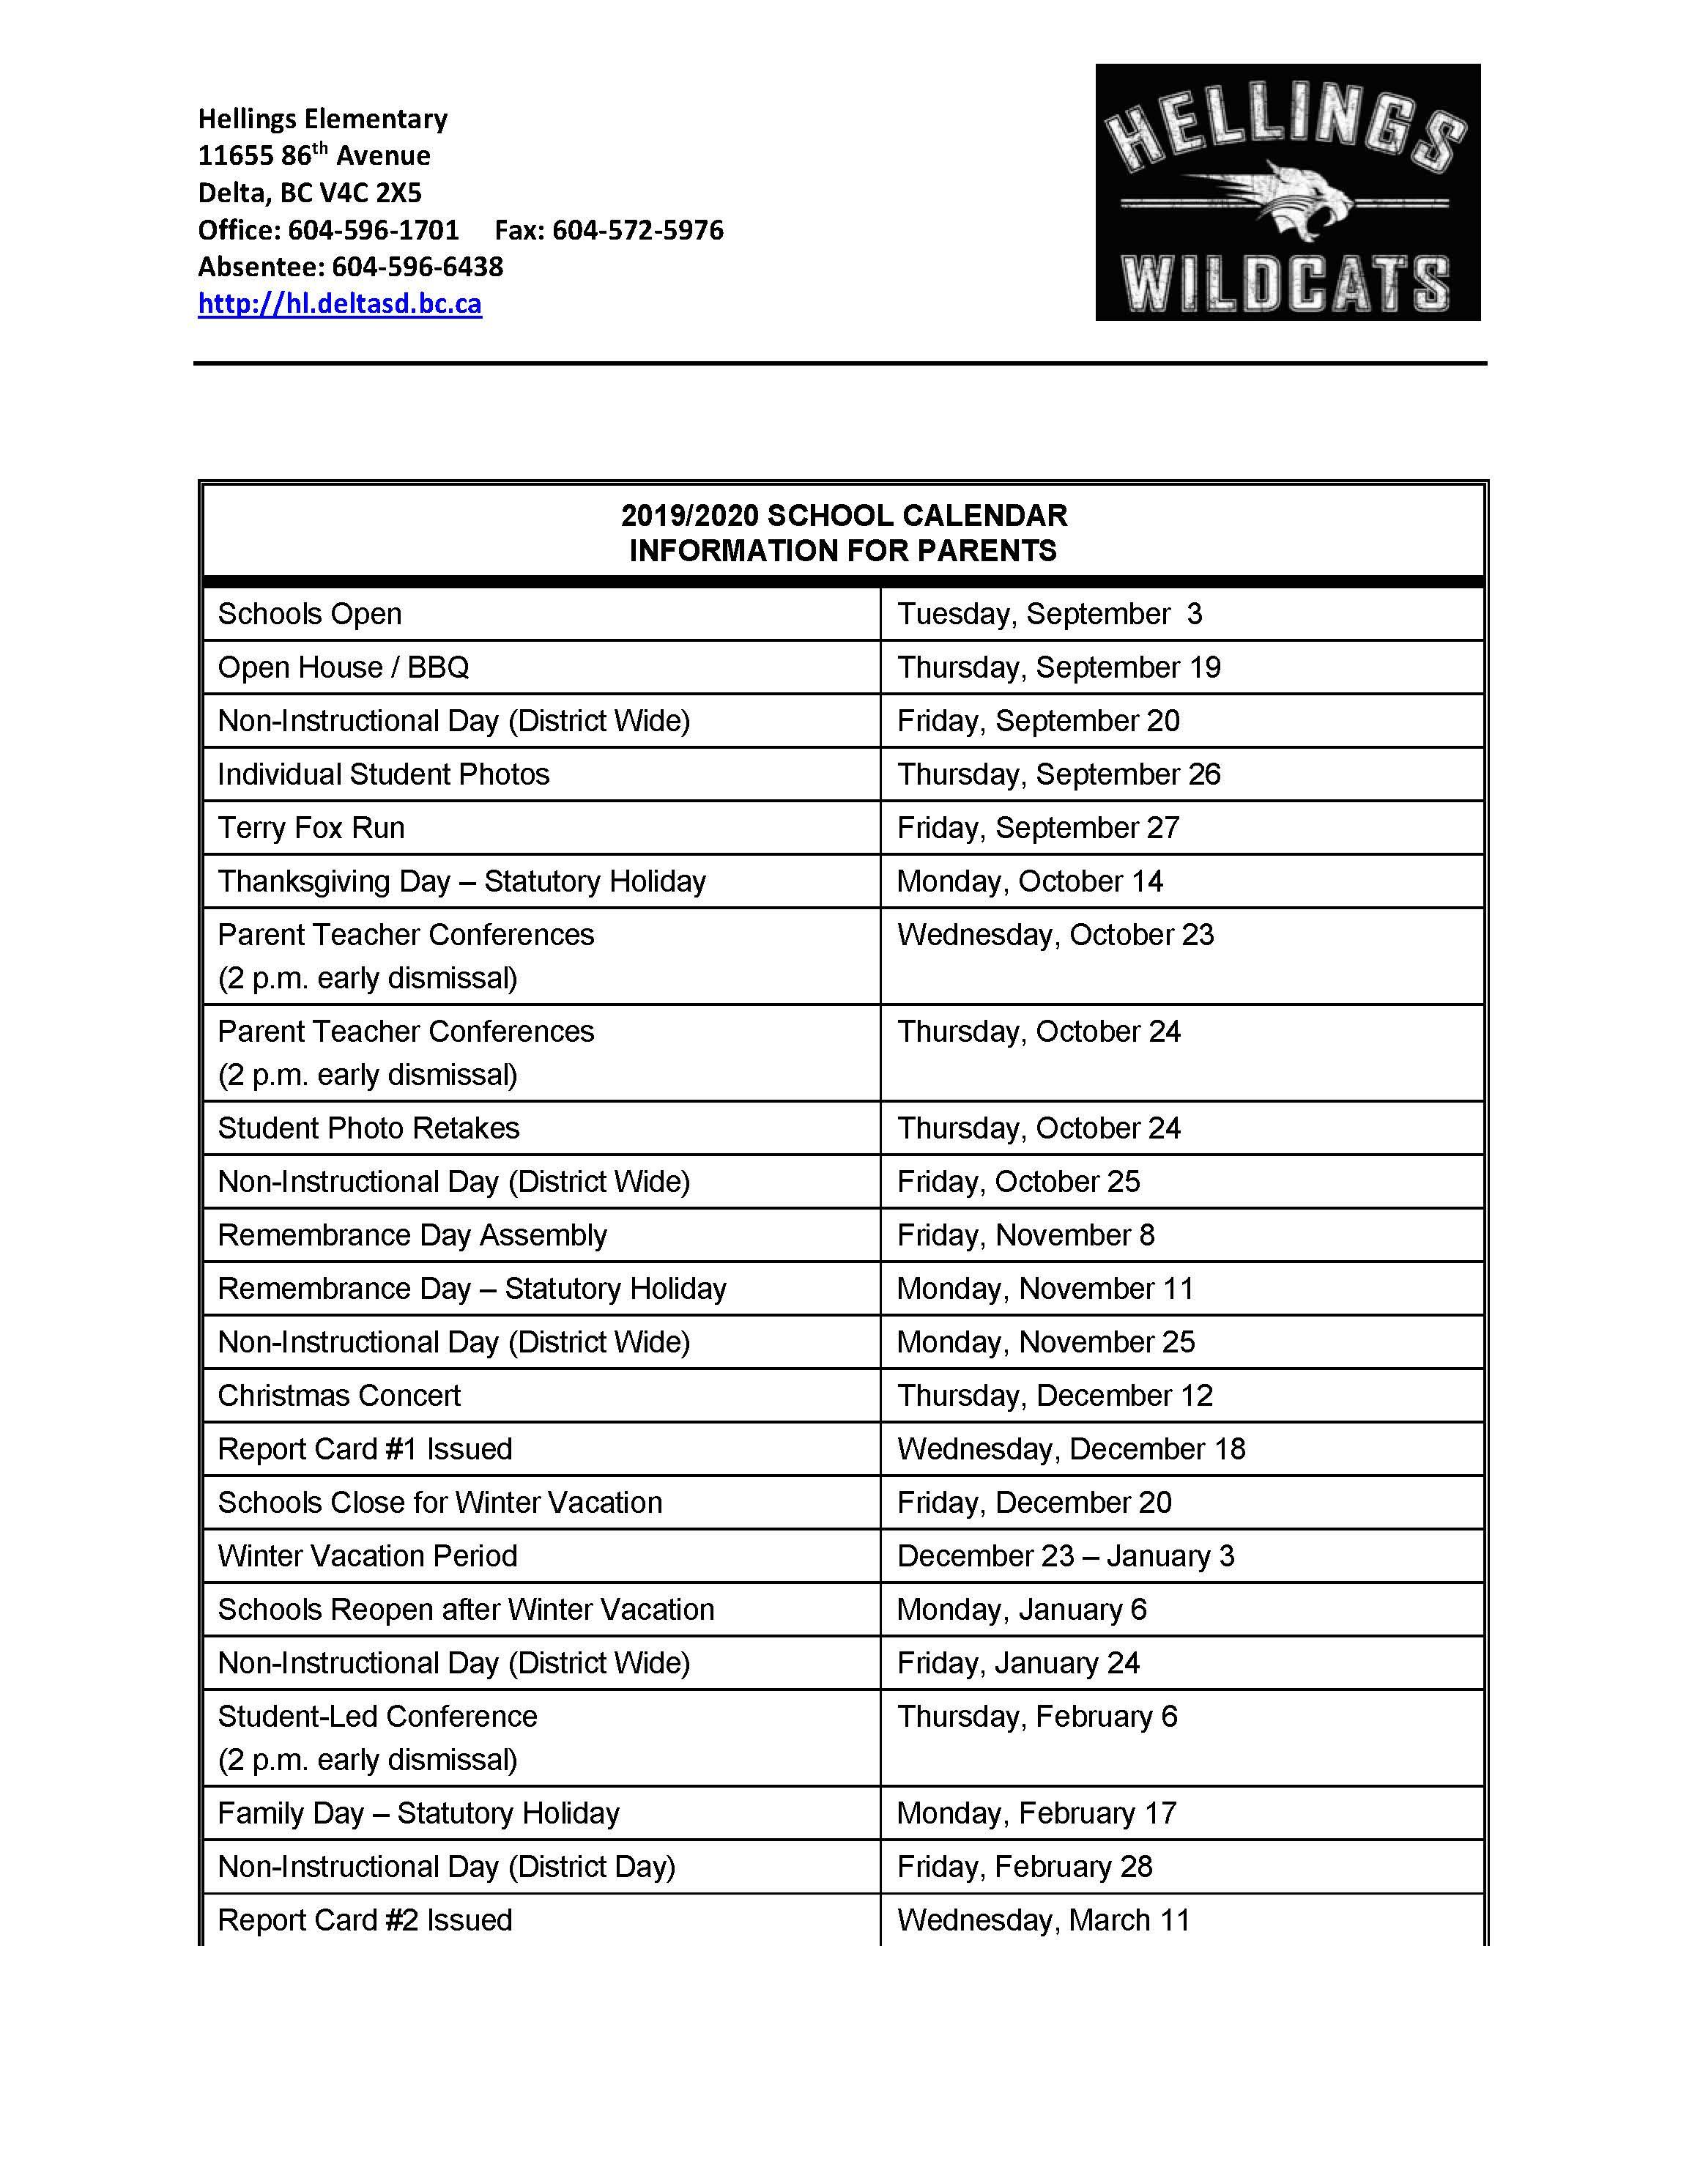 Calendar Tuesday December 18 2020 School Calendar 2019 2020   Hellings Elementary